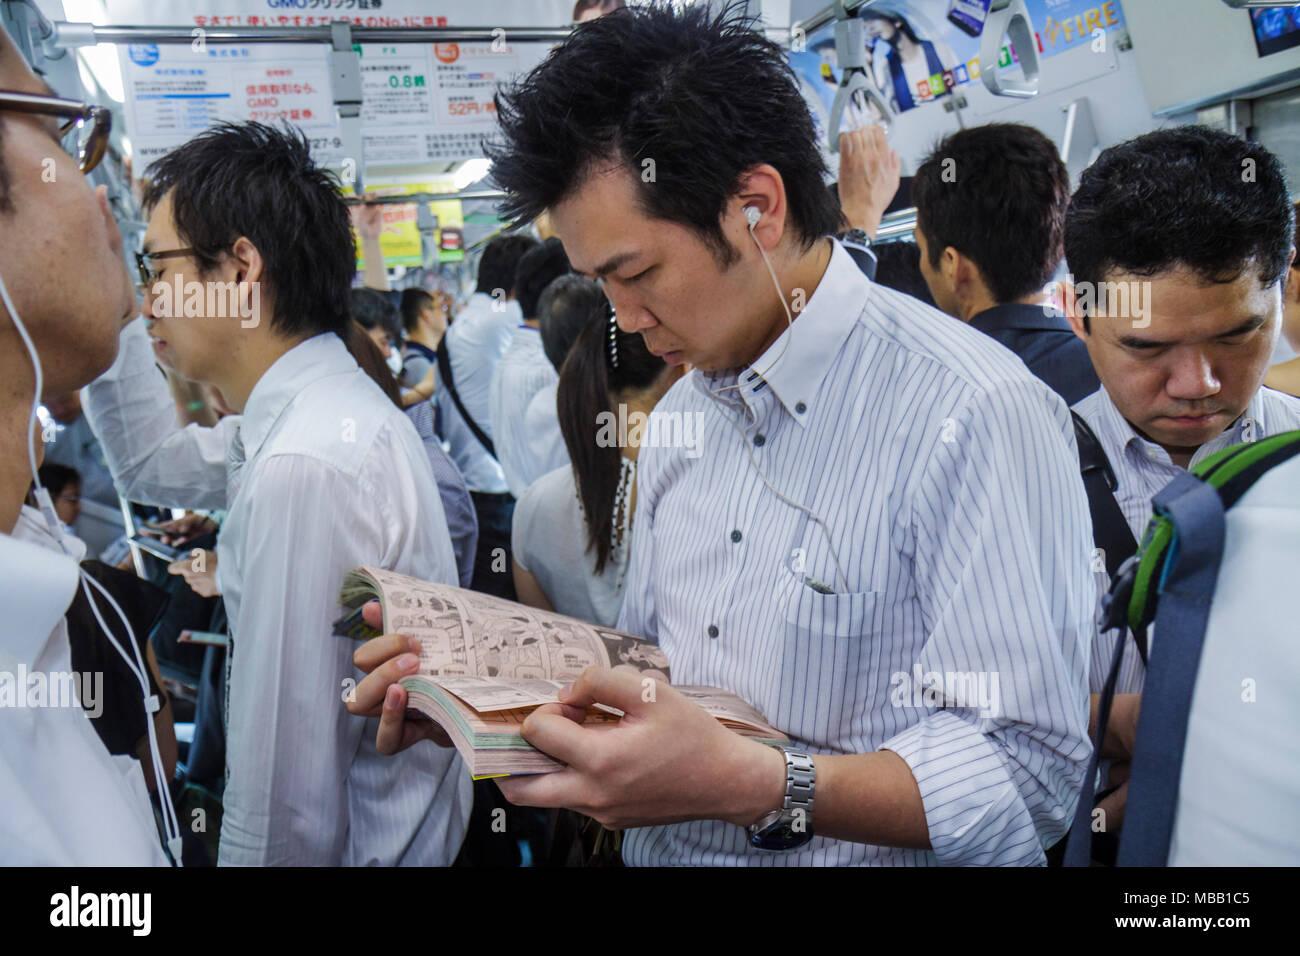 Tokyo Japan Yurakucho JR Yurakucho Station Yamanote Line Asian man crowded standing commuters train car strap holders reading co - Stock Image